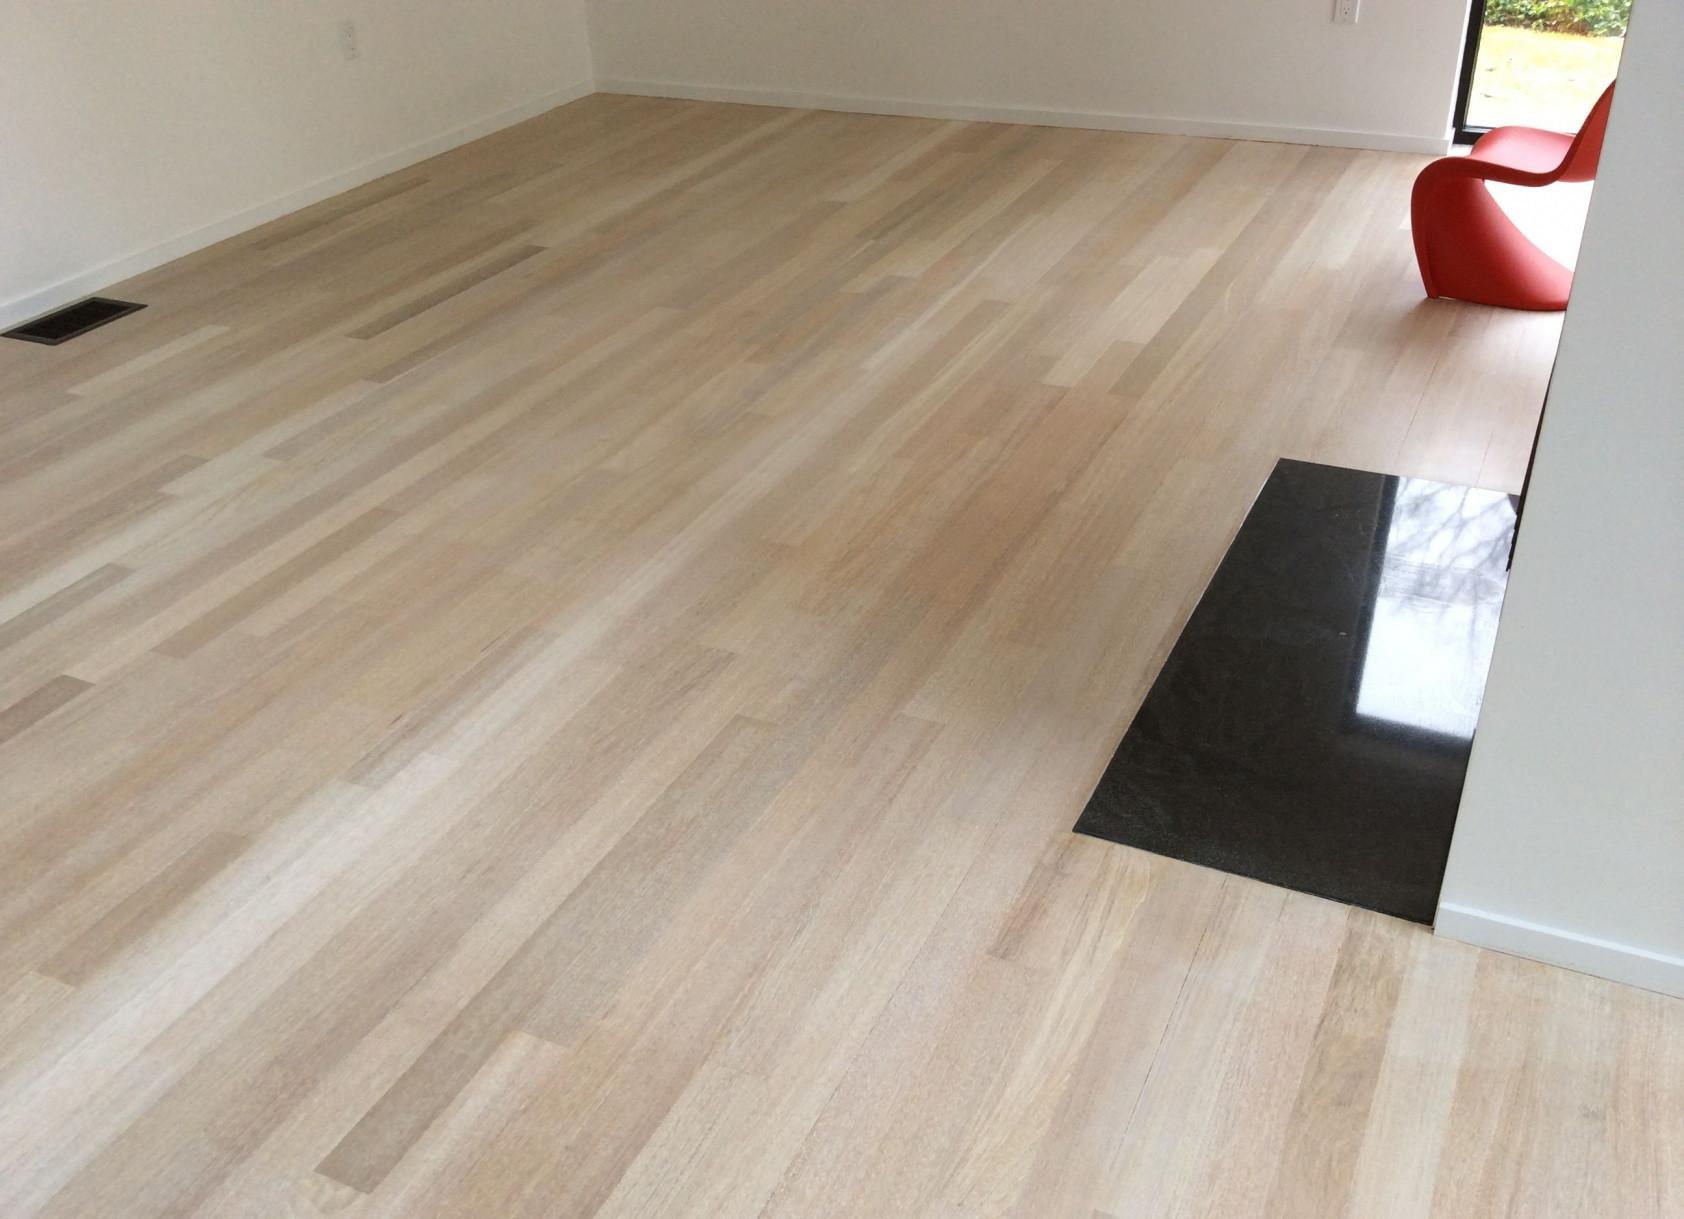 types of hardwood floor finishes of wood floor finishes vykup hodinek info within wood floor finishes pickled wood floor finishes floors in general pinterest